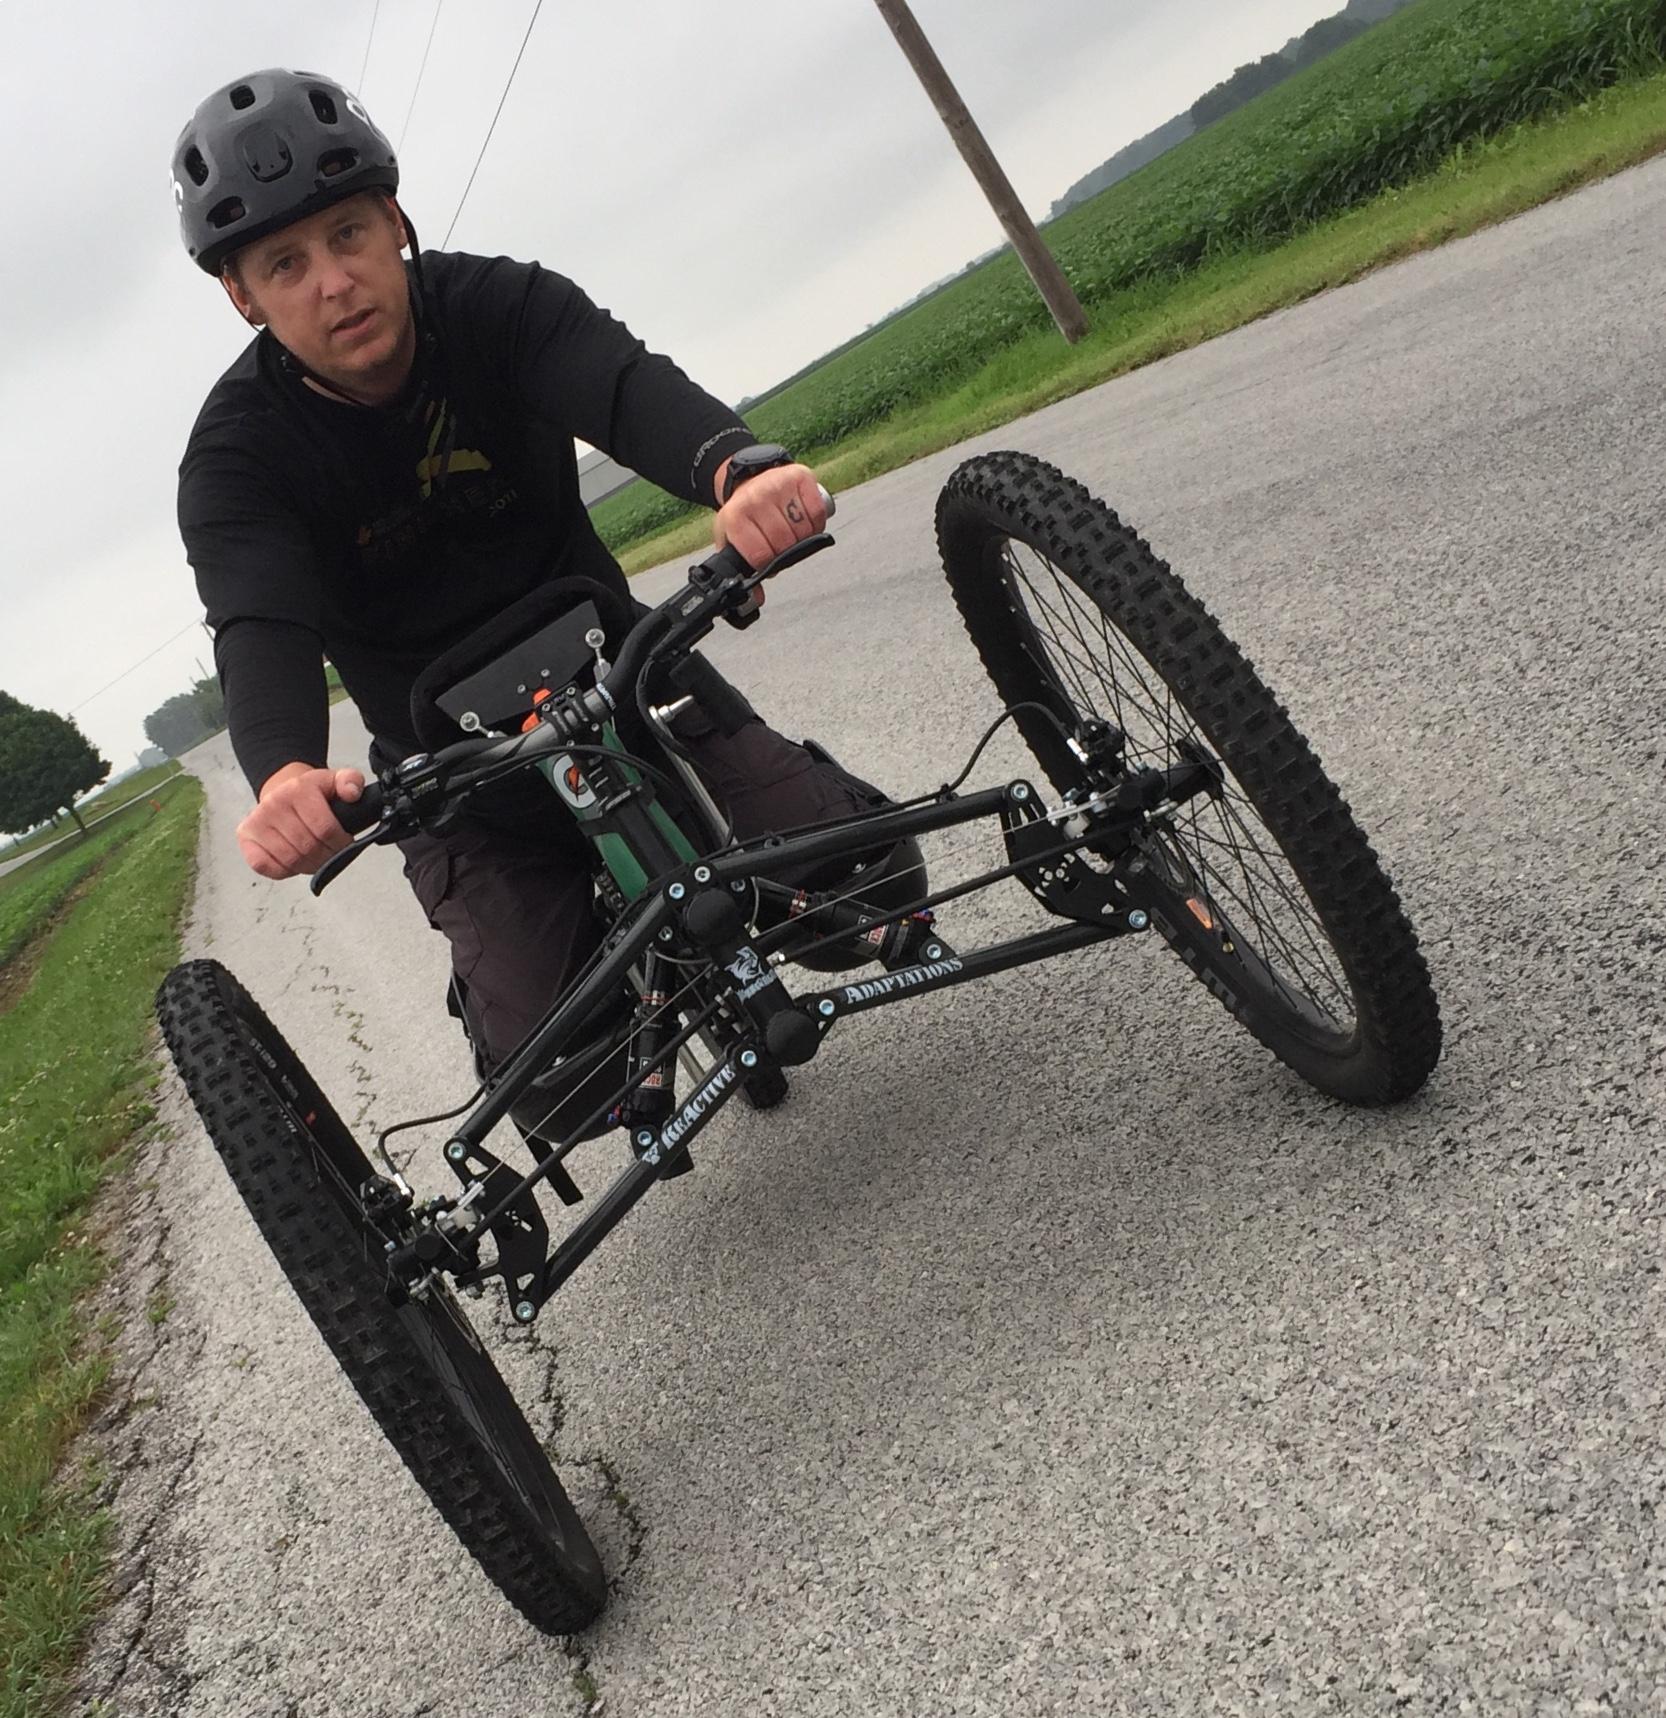 GoHawkeye grant helps Ben Hulin buy handcycle